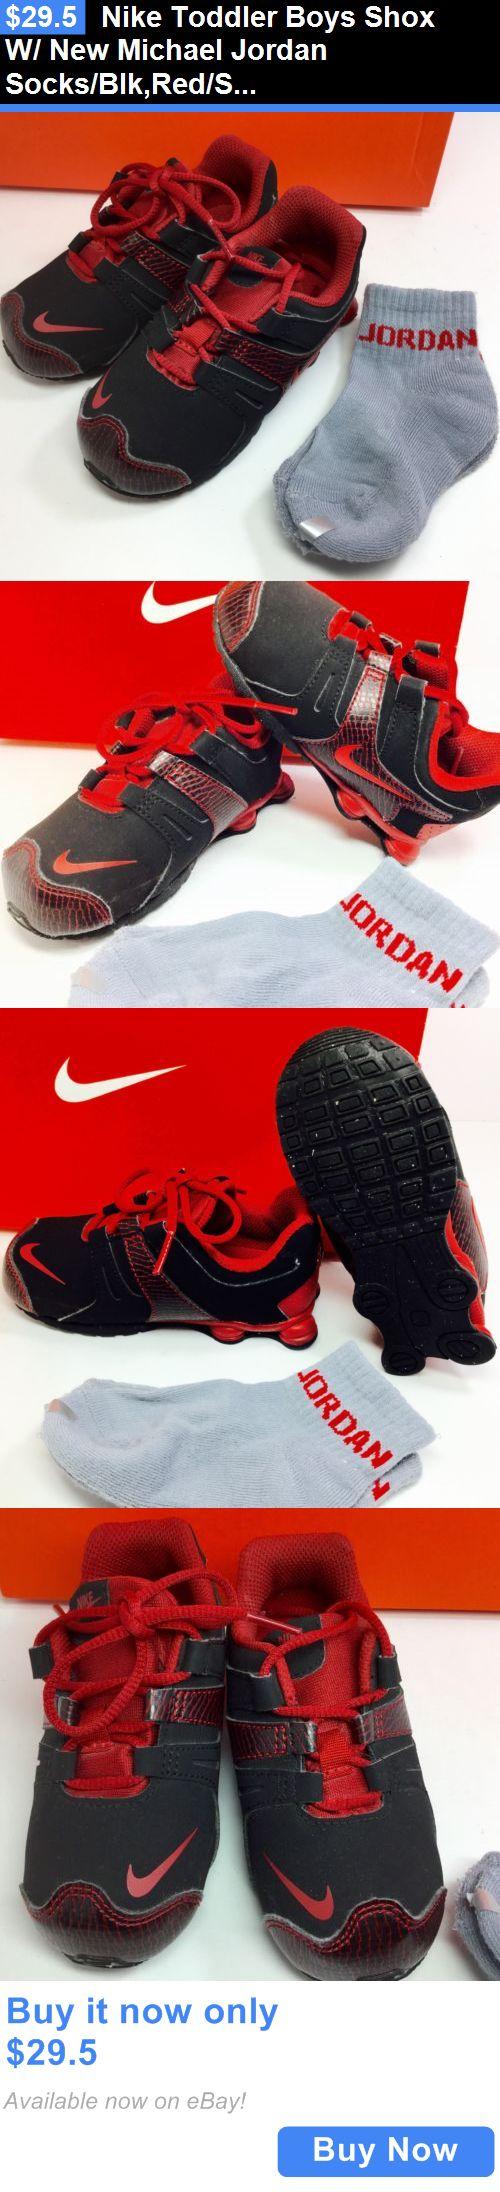 Michael Jordan Baby Clothing: Nike Toddler Boys Shox W/ New Michael Jordan Socks/Blk,Red/Size 8C/ Excellent!!! BUY IT NOW ONLY: $29.5